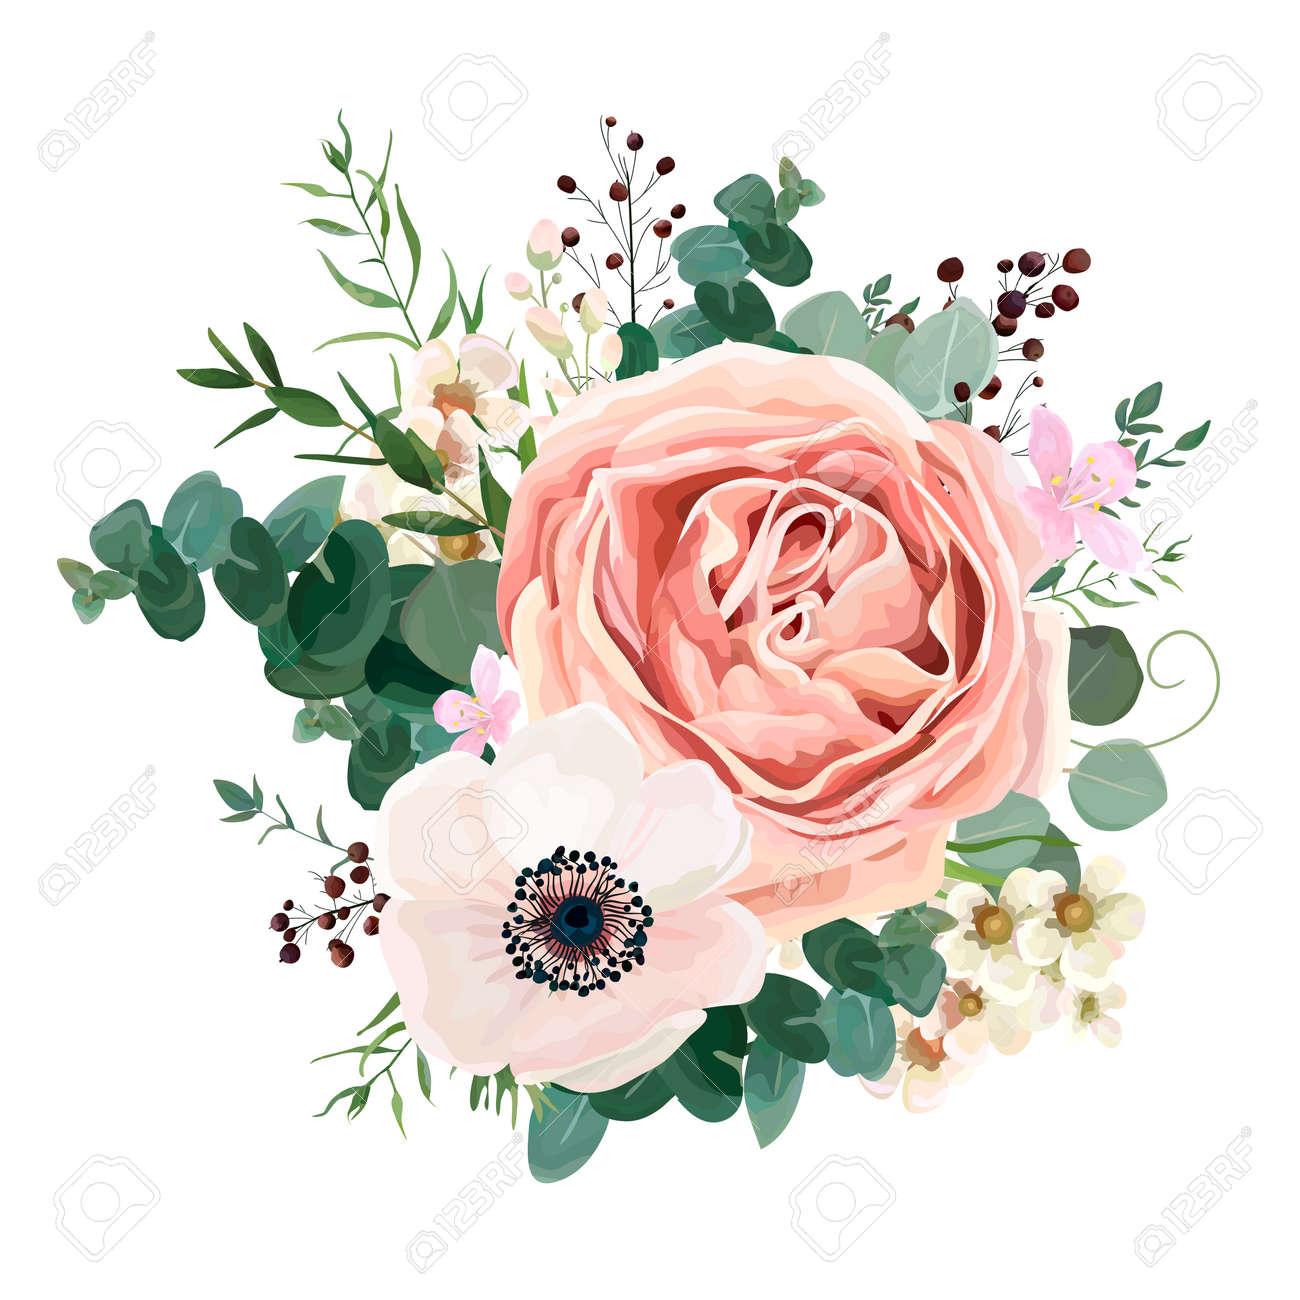 Floral card vector Design: garden flower lavender pink peach Rose white Anemone wax green Eucalyptus thyme leaves elegant greenery, berry, forest bouquet print.Wedding rustic Invitation elegant invite. - 92810788